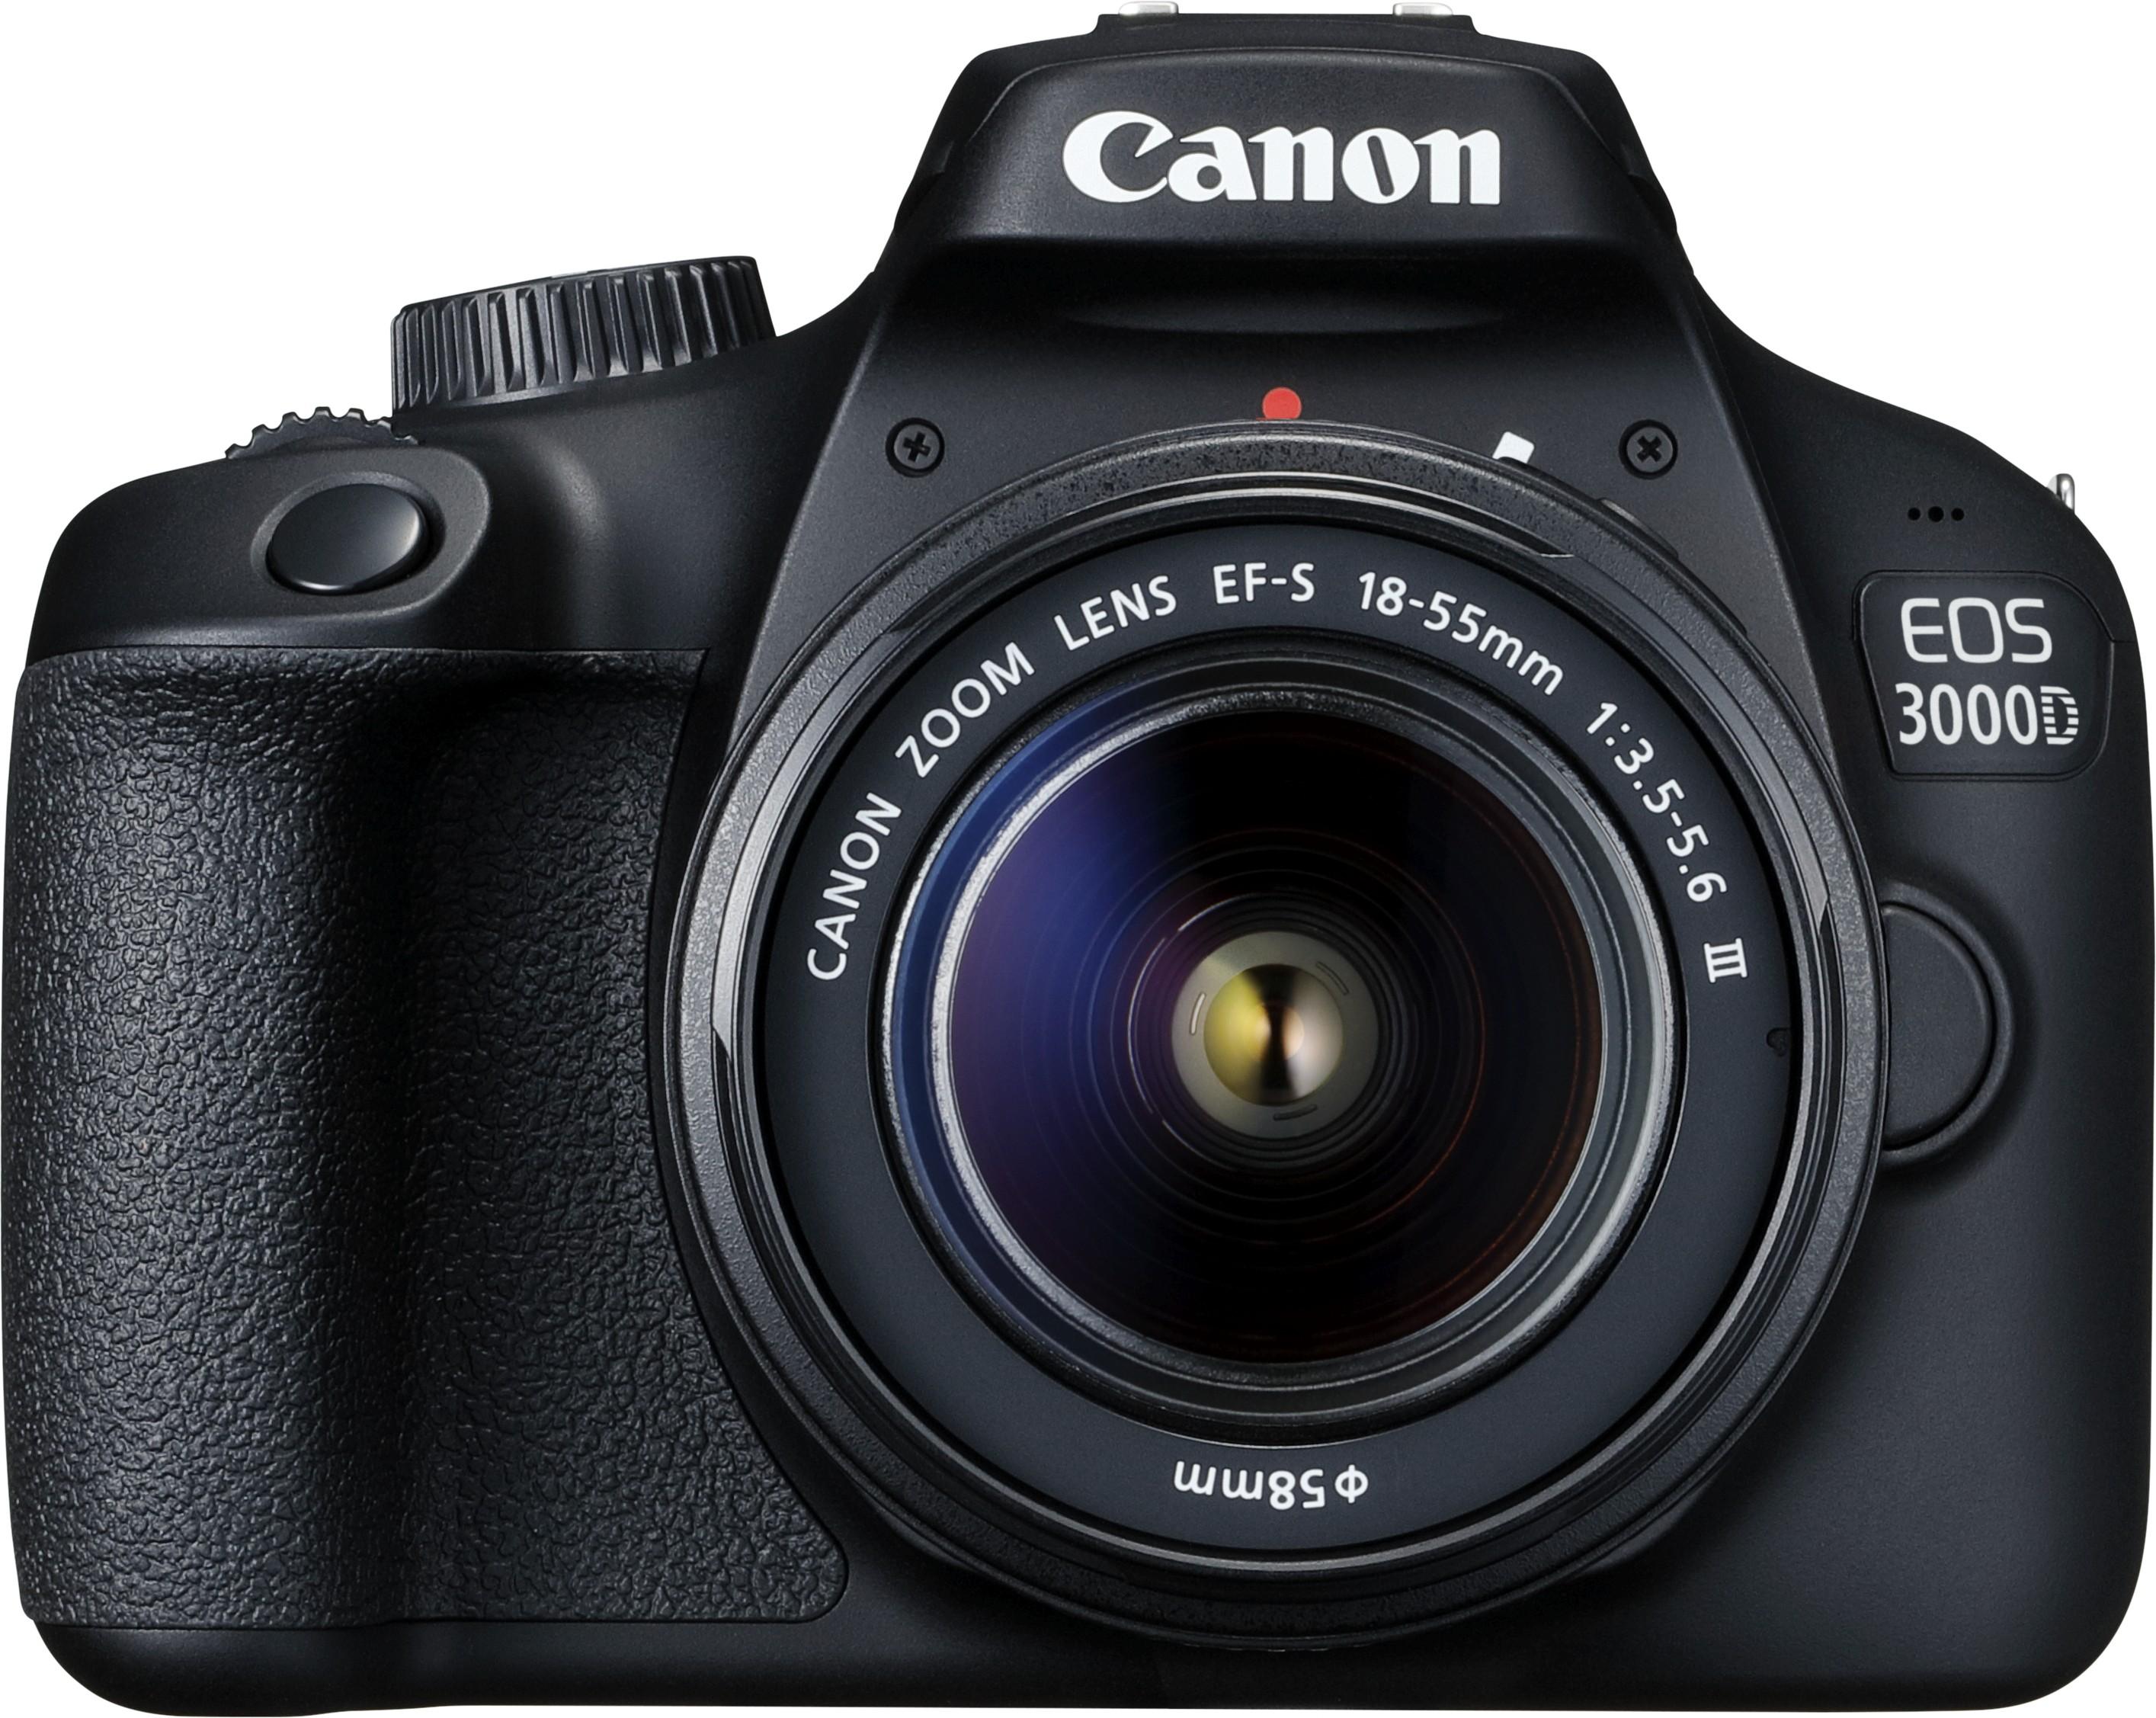 Canon EOS 3000D DSLR Camera Image